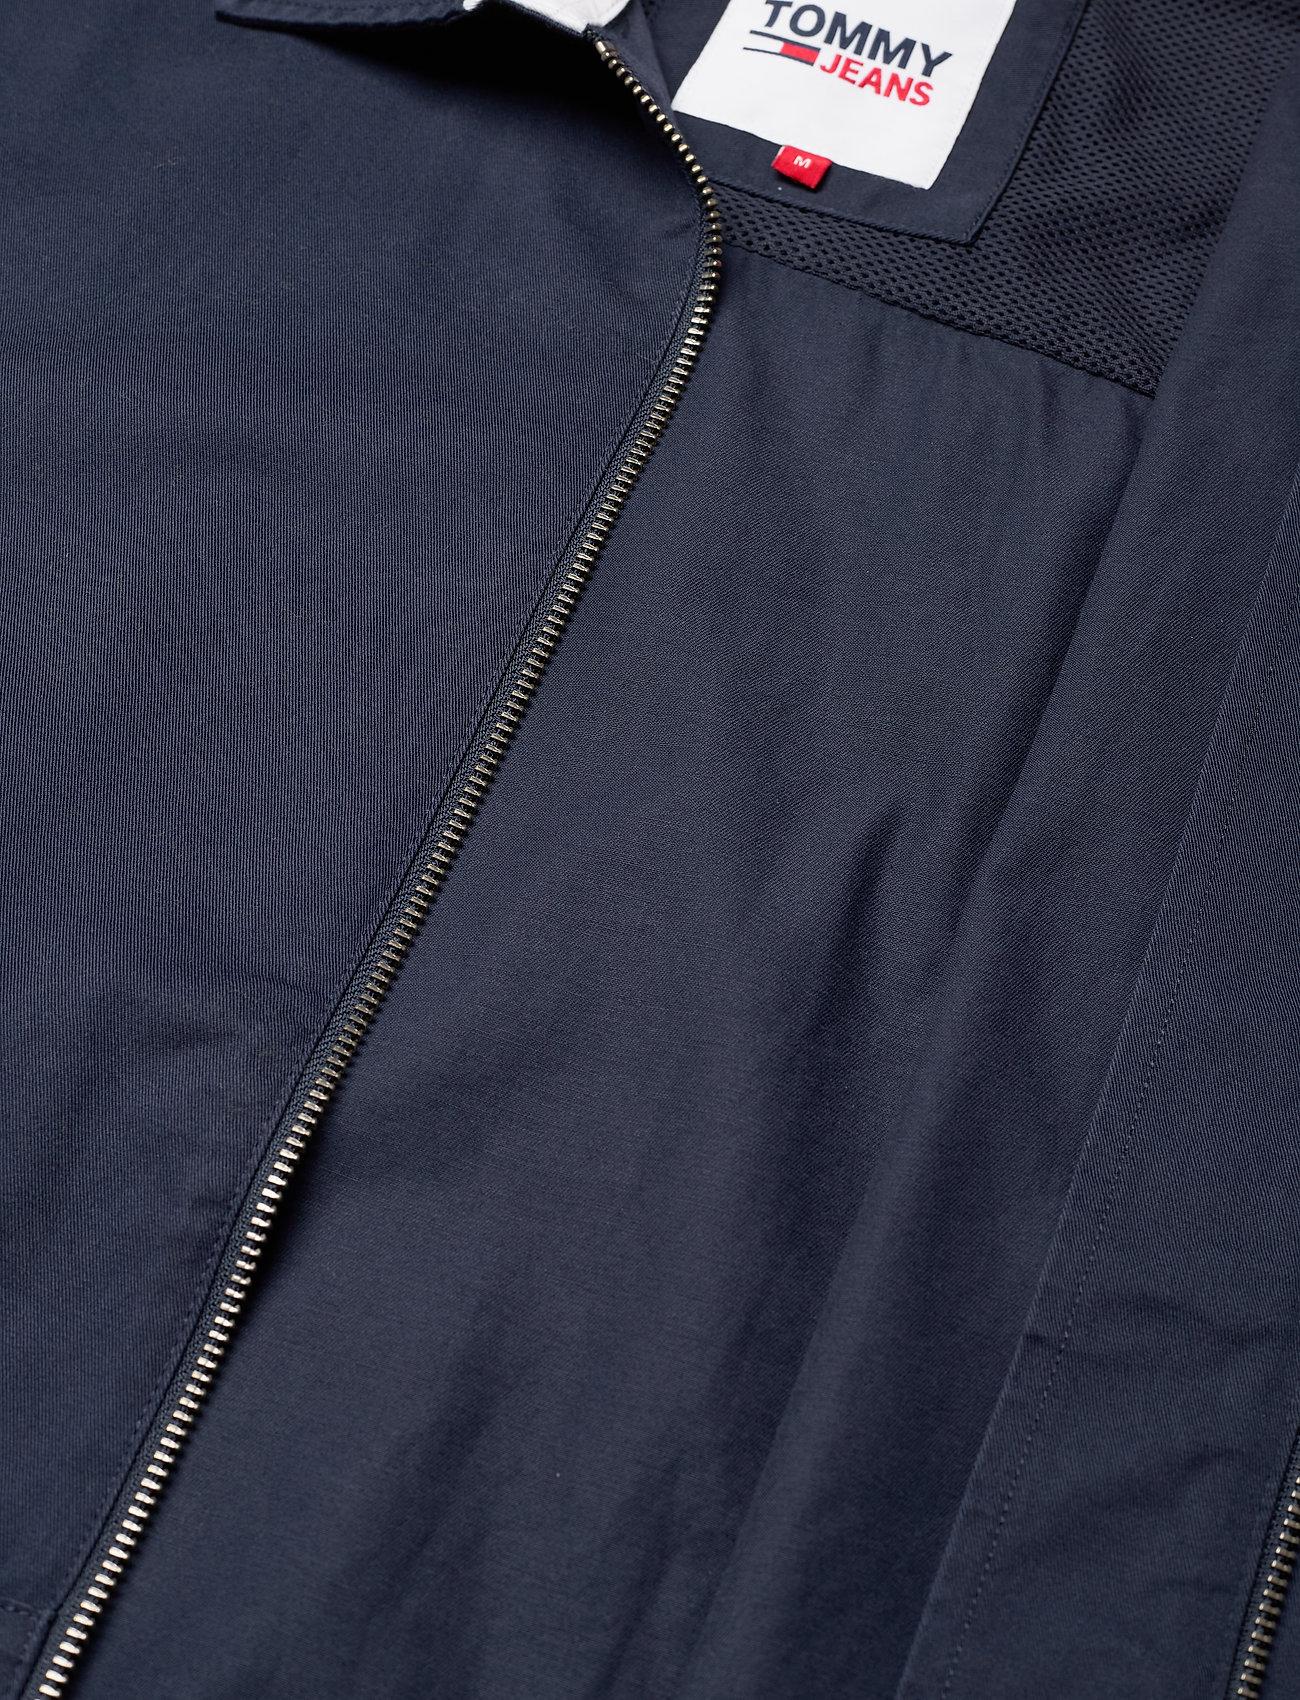 Tommy Jeans - TJM CASUAL COTTON JACKET - kurtki dżinsowe - twilight navy - 3